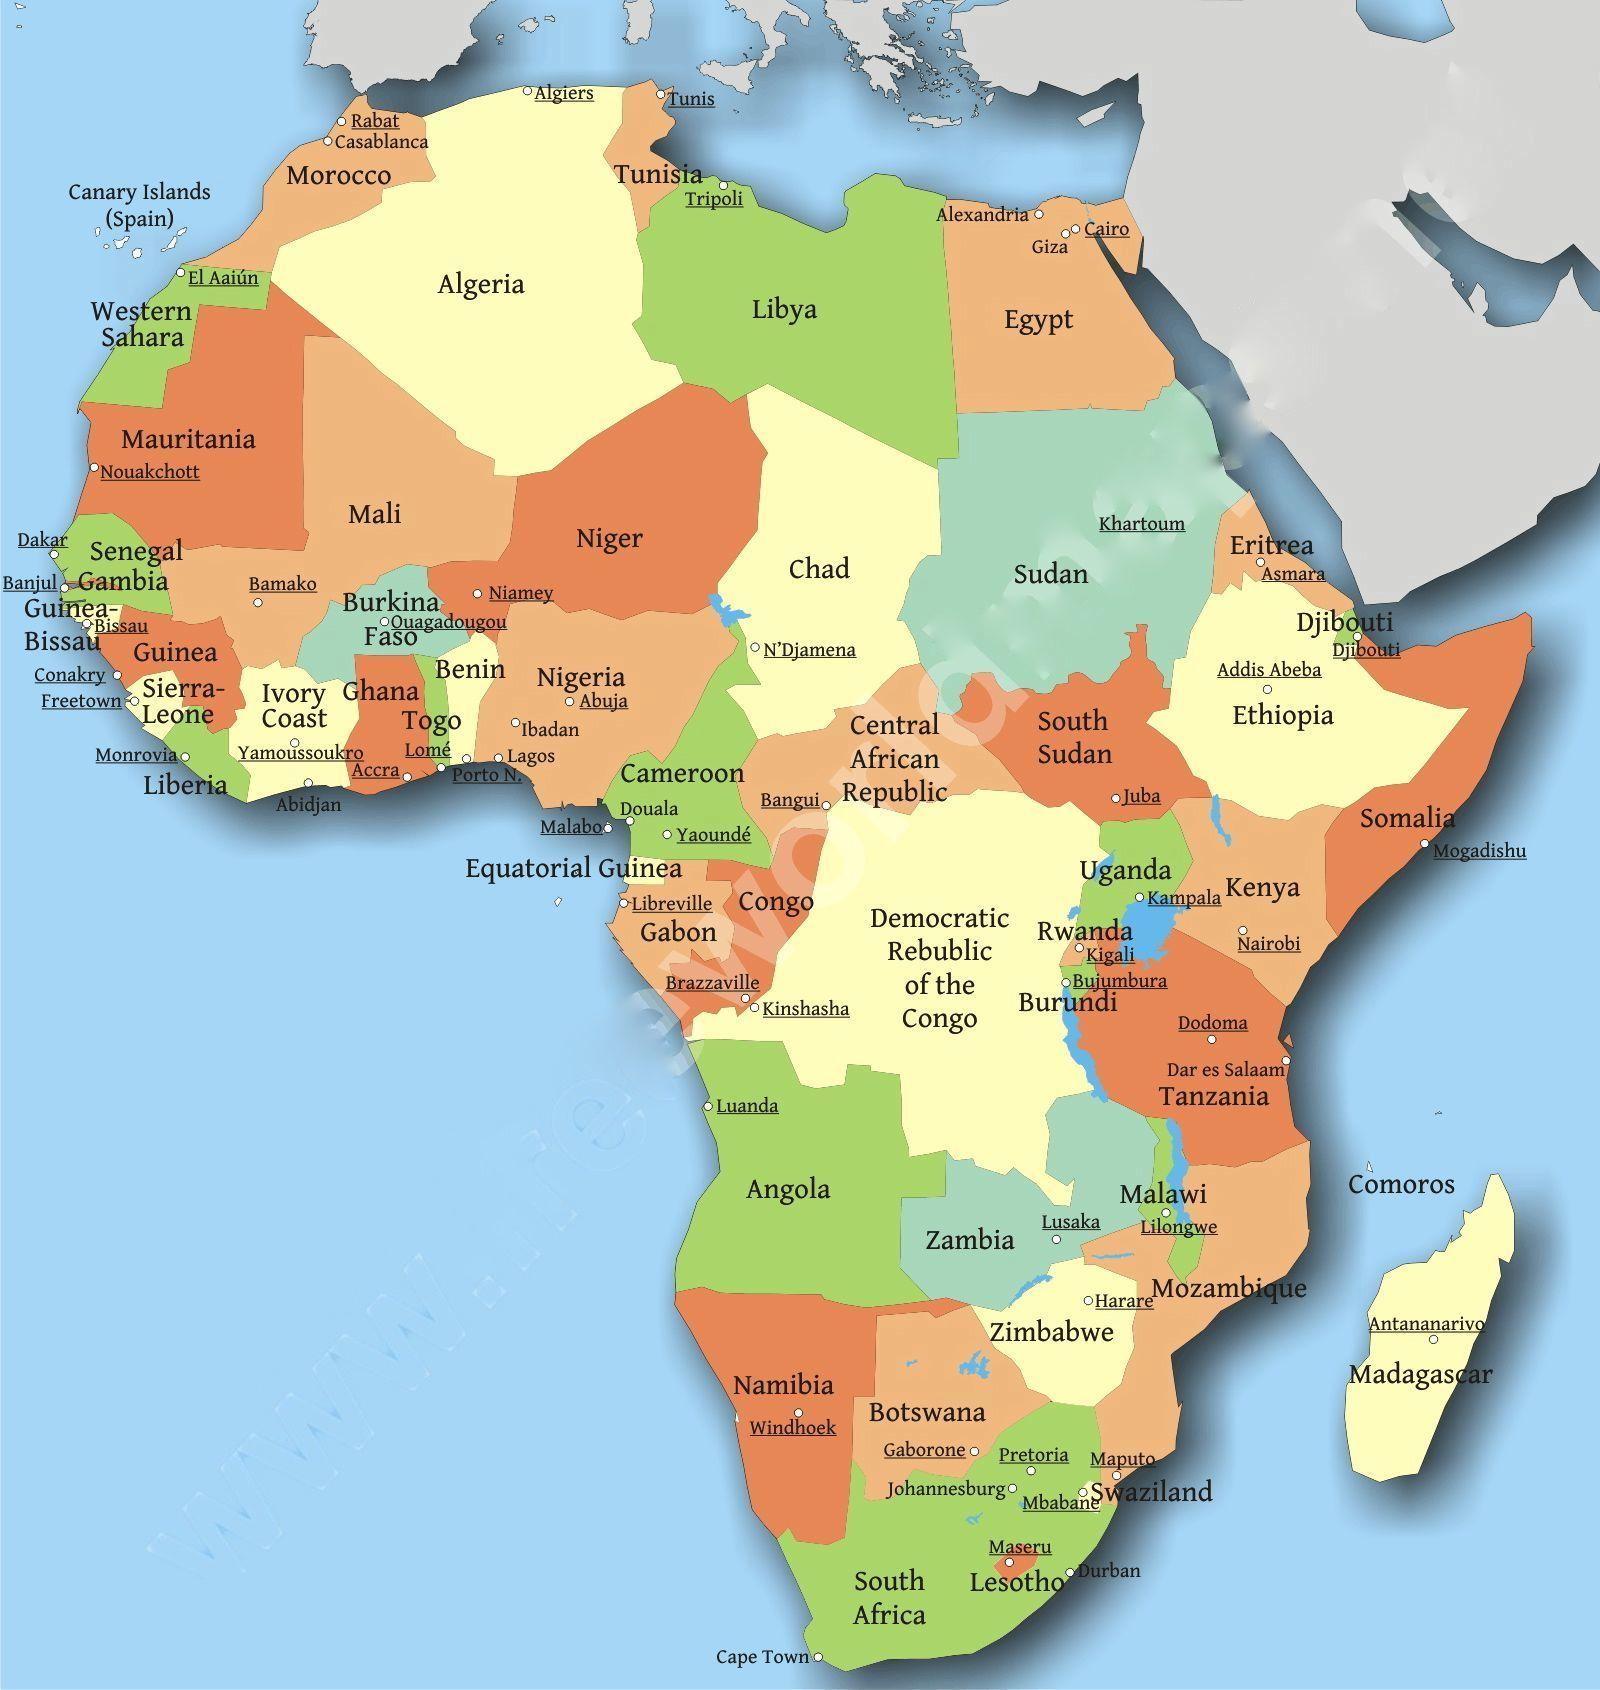 africa_map1 | Homeschool English | Pinterest | African ... African Countries Map